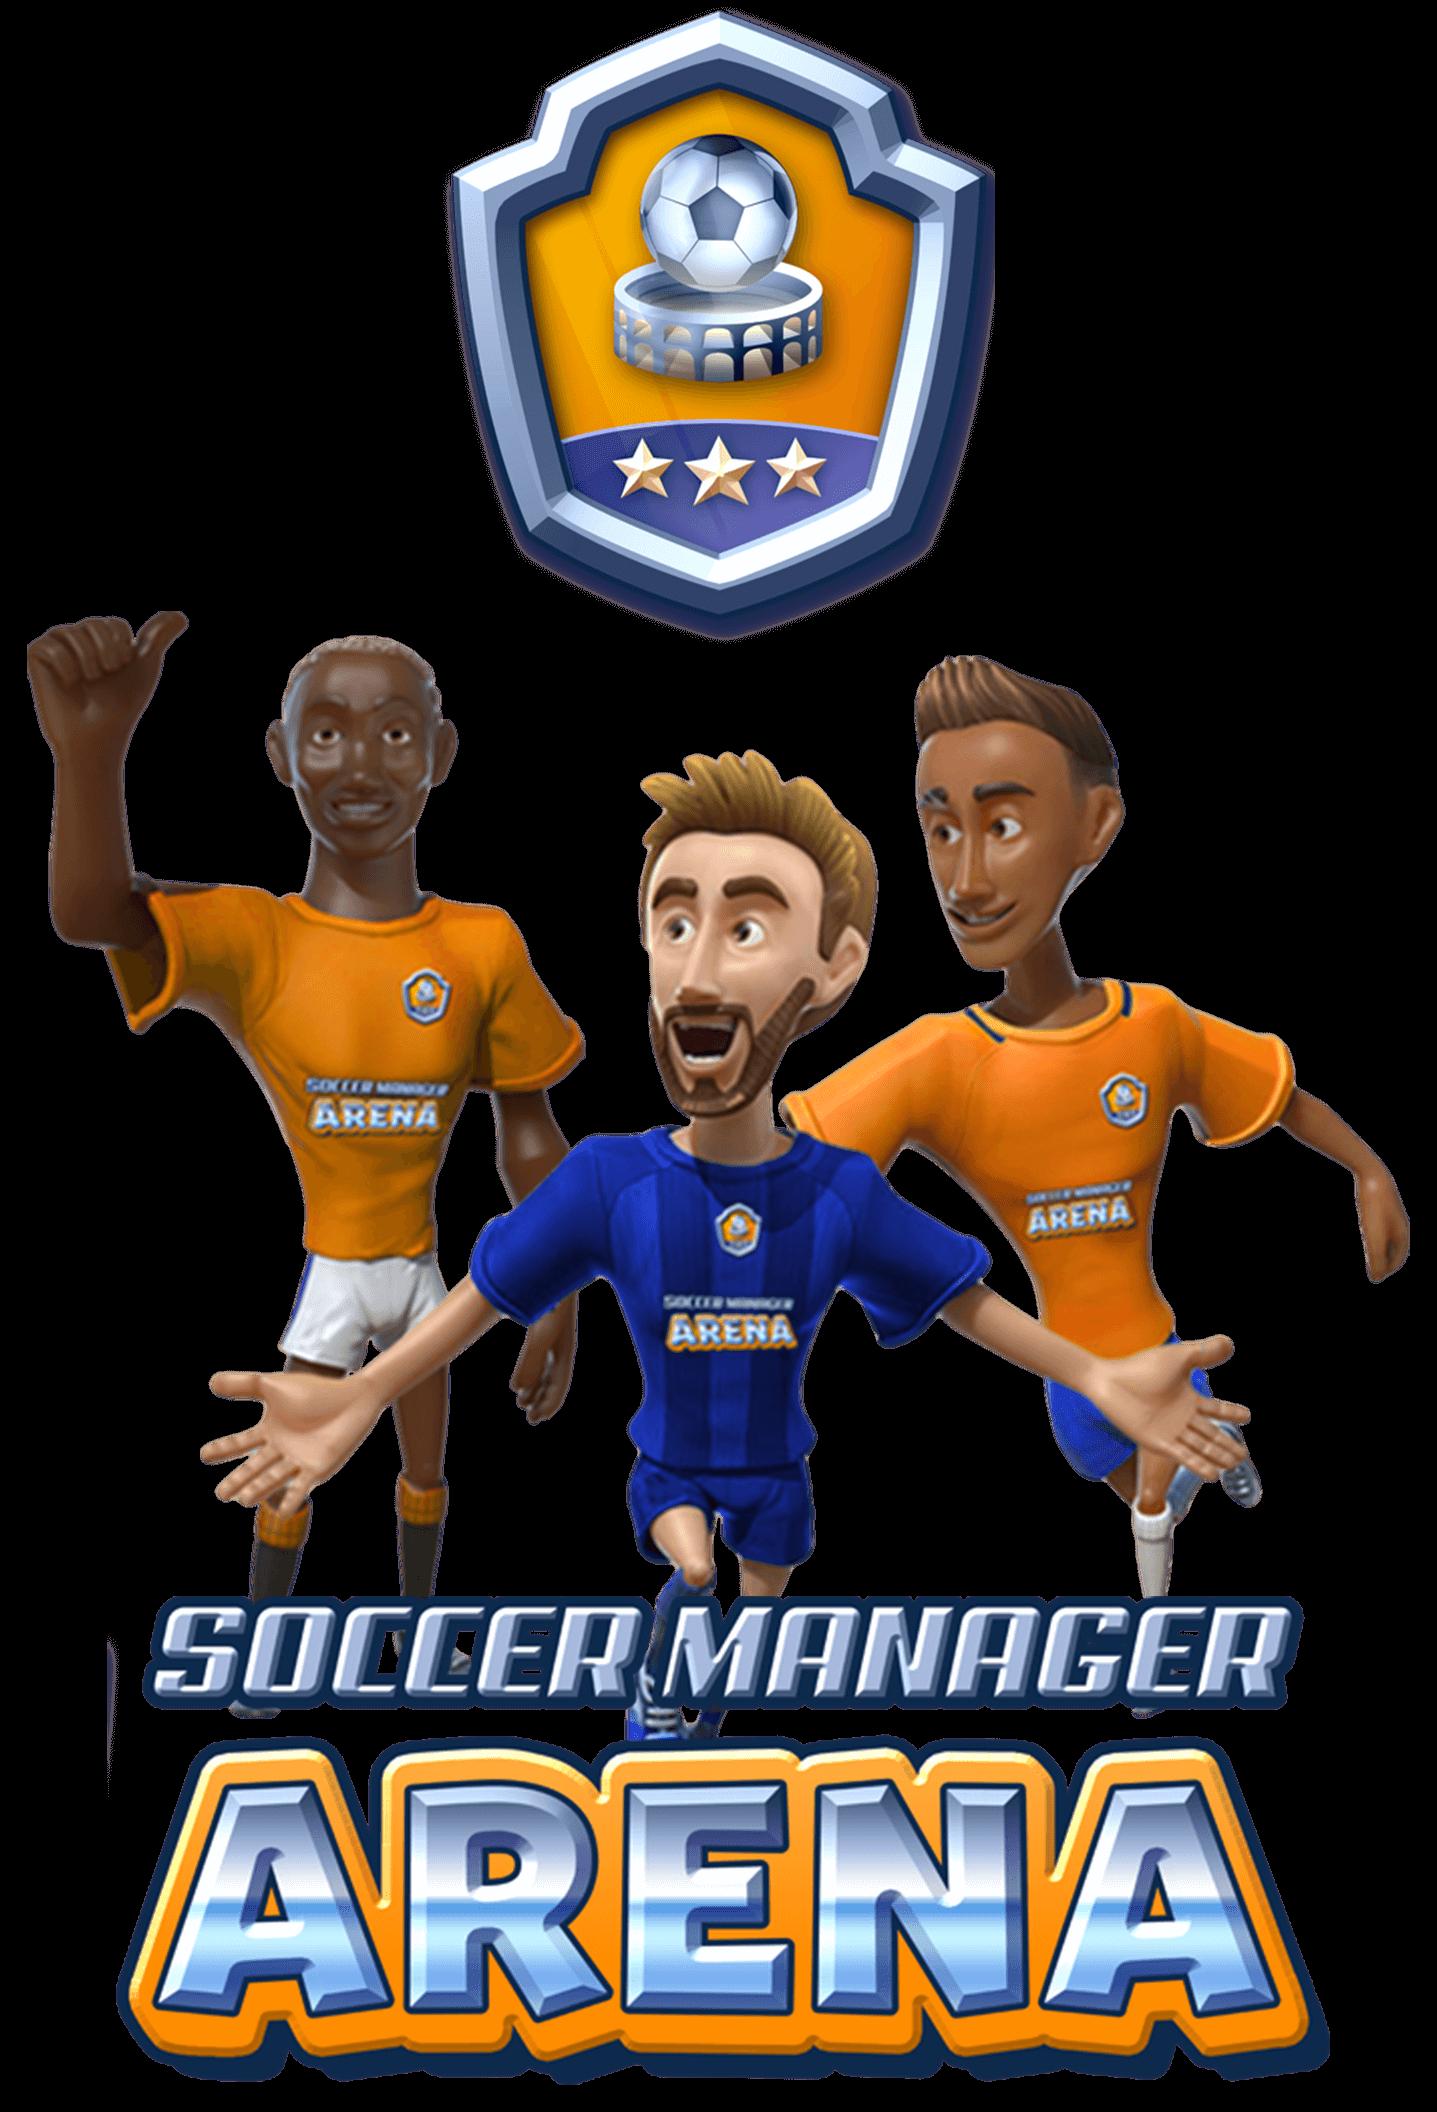 Free online soccer manager game - Soccer Manager Soccer Manager